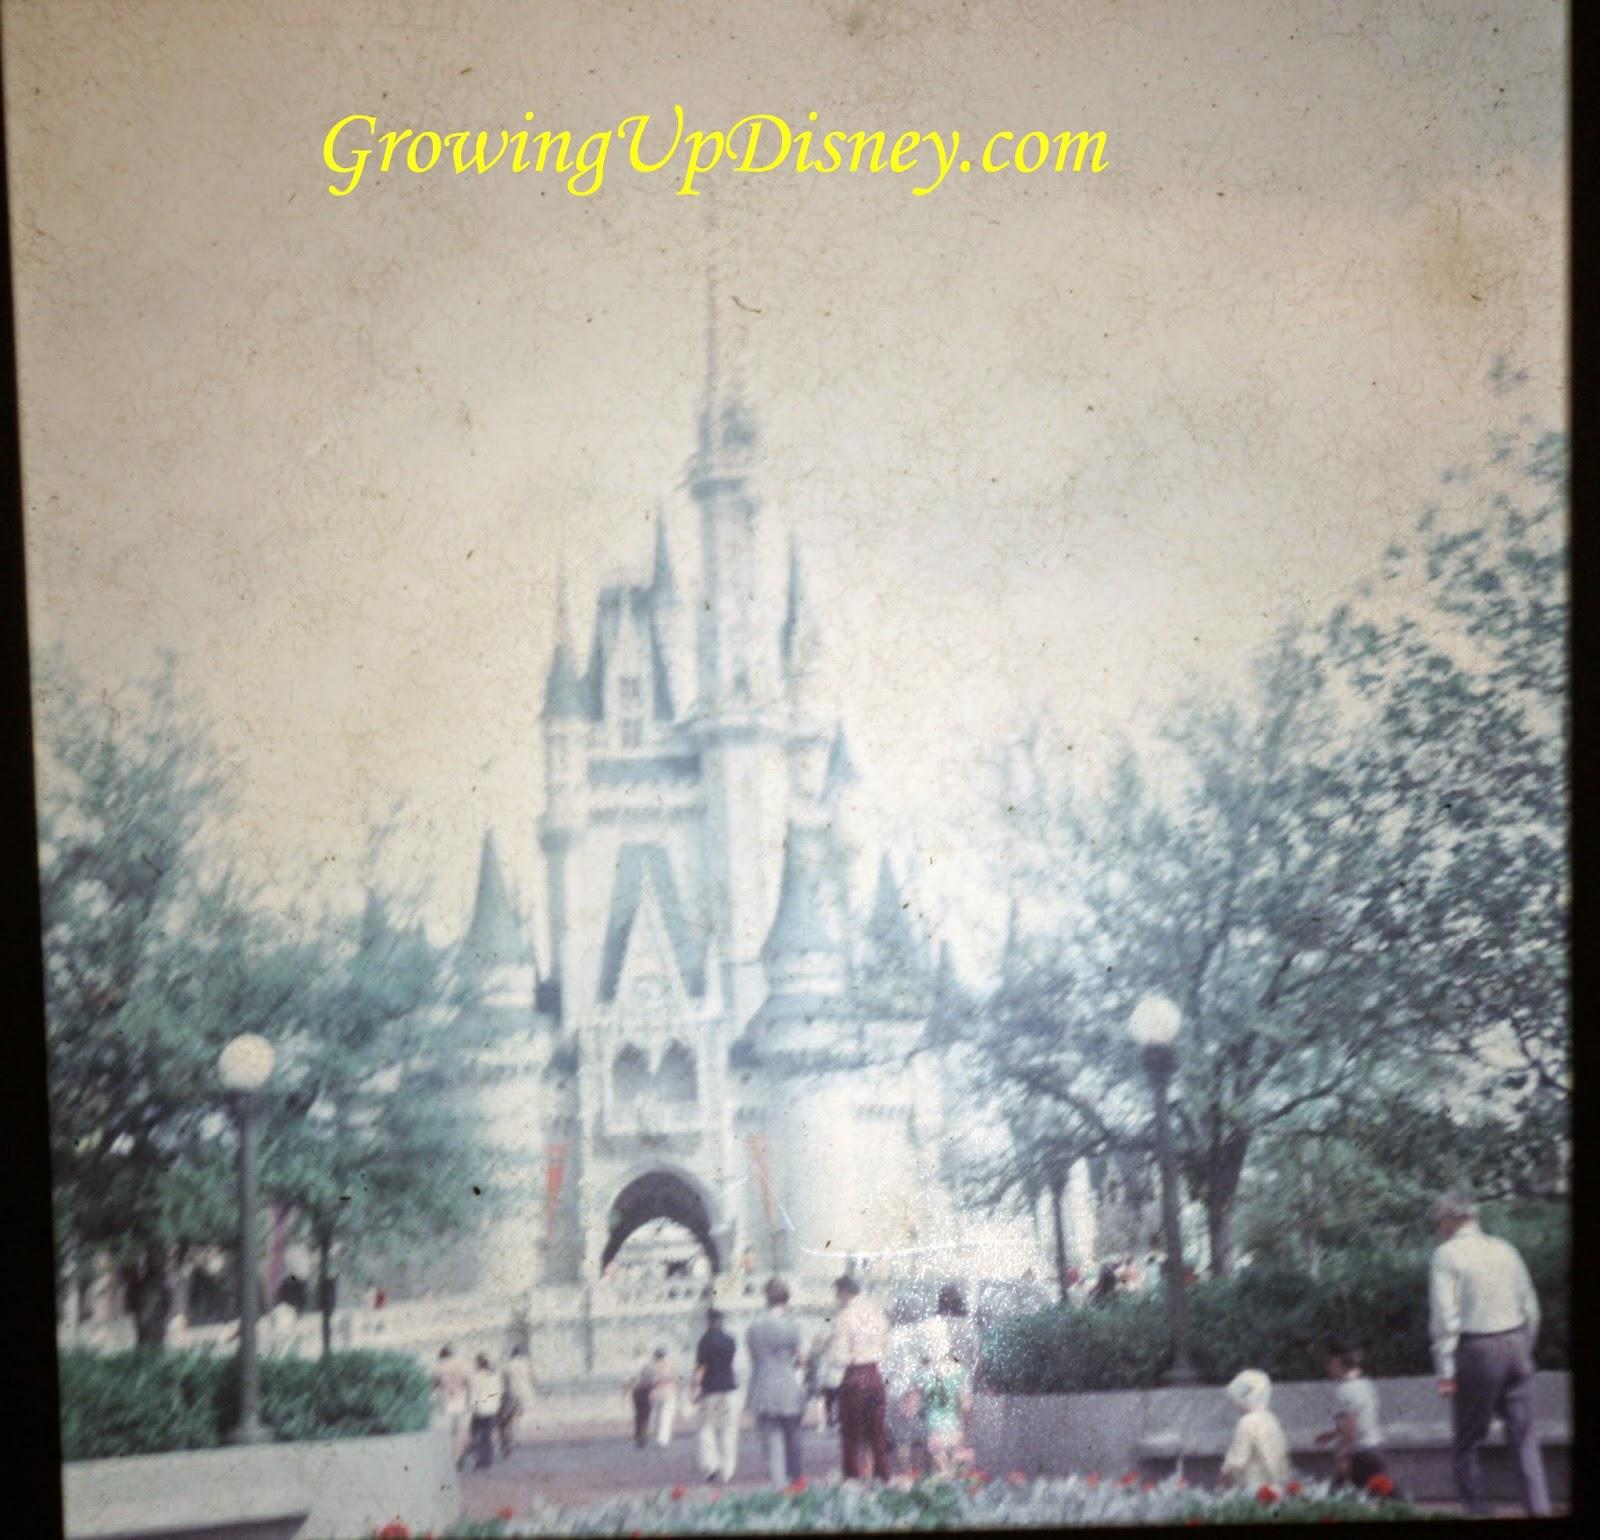 1973 Cinderella Castle in the Magic Kingdom, Walt Disney World, vintage Disney